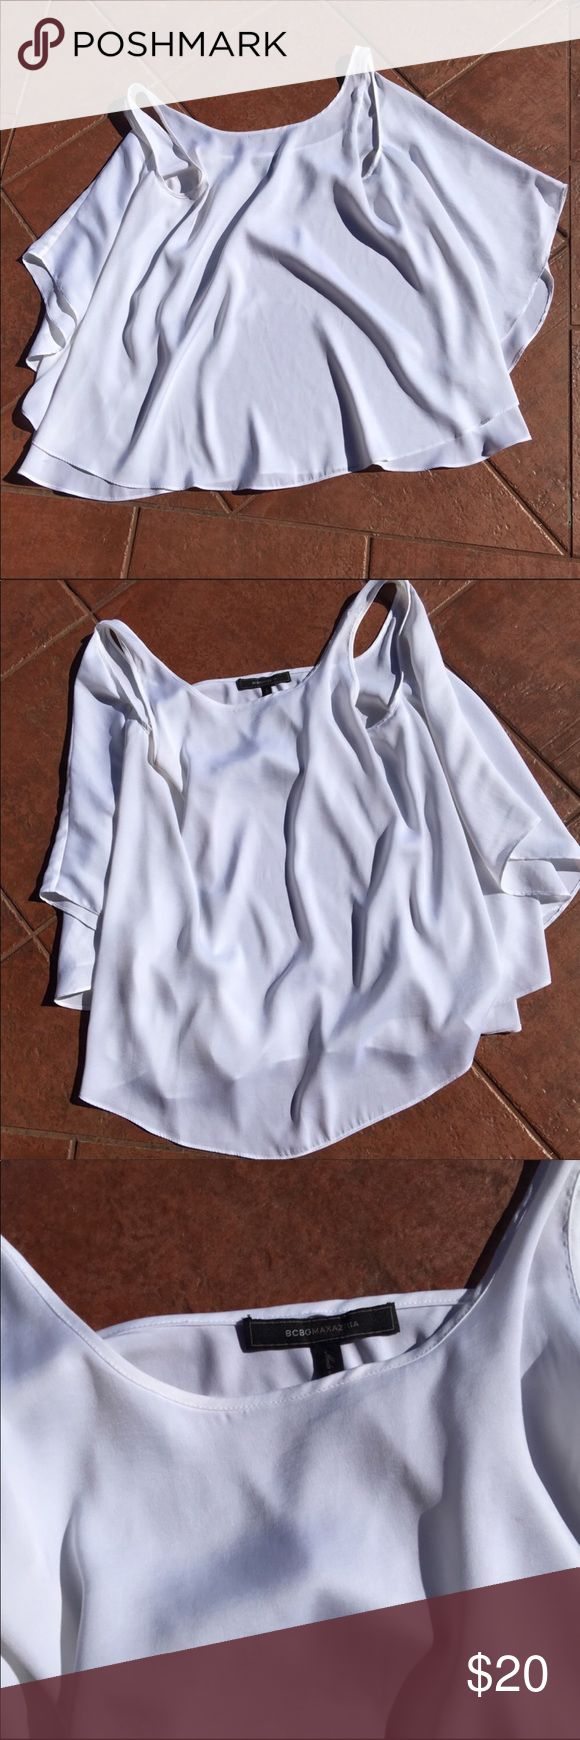 "Bcbgmaxazria Women's Sleeveless Top Small Bcbgmaxazria Women's Sleeveless Top Small 16"" arm pit to arm pit. 28"" length BCBGMaxAzria Tops Blouses"